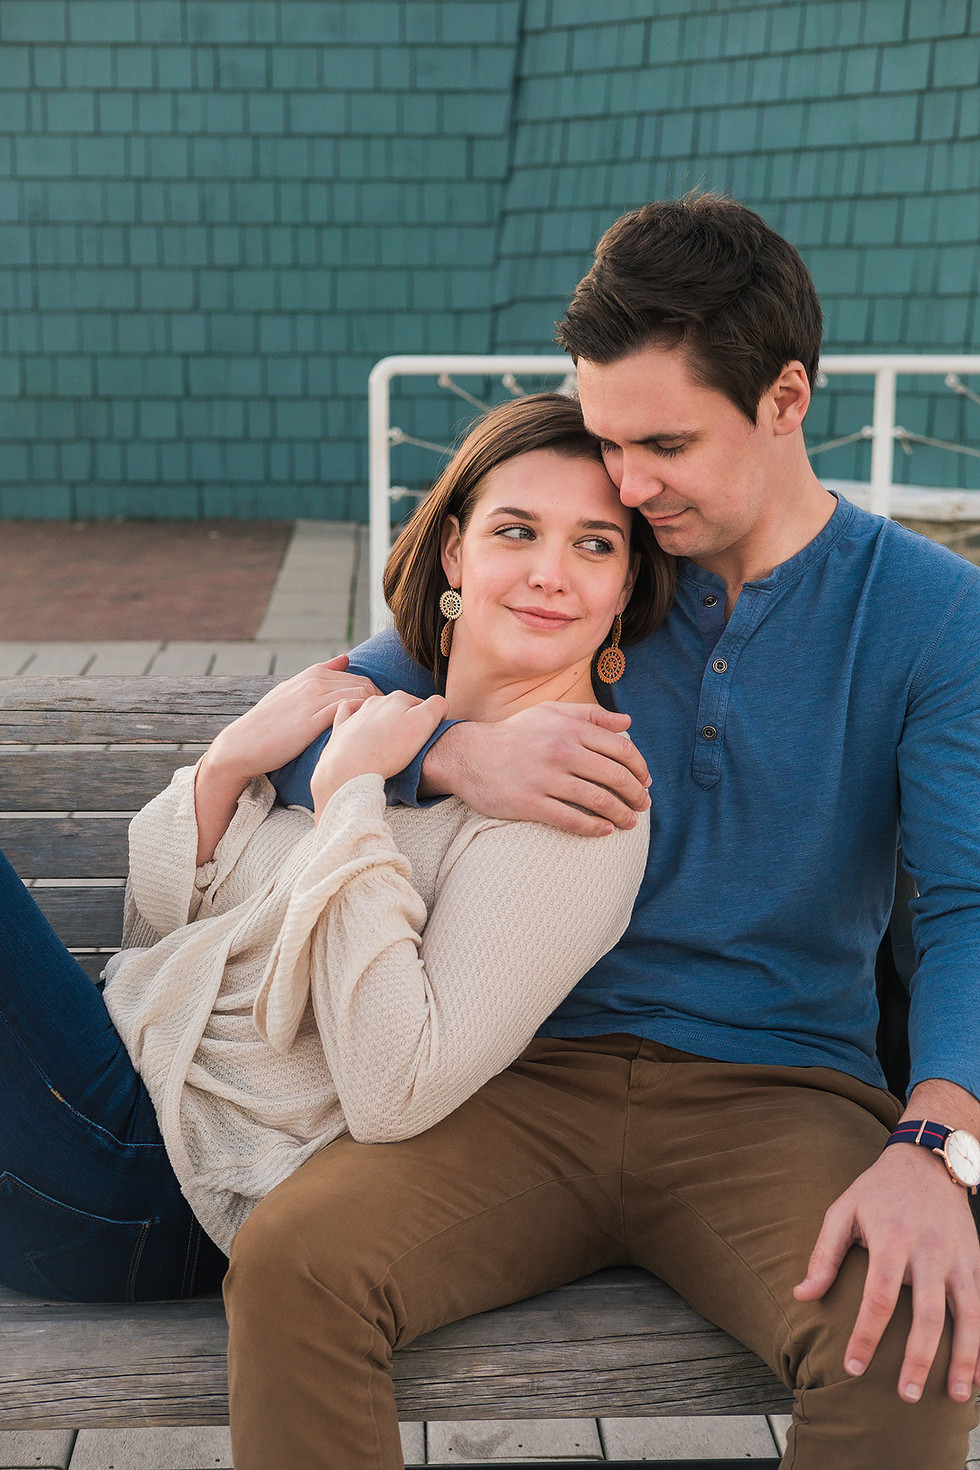 Cuddling Engagement Photography